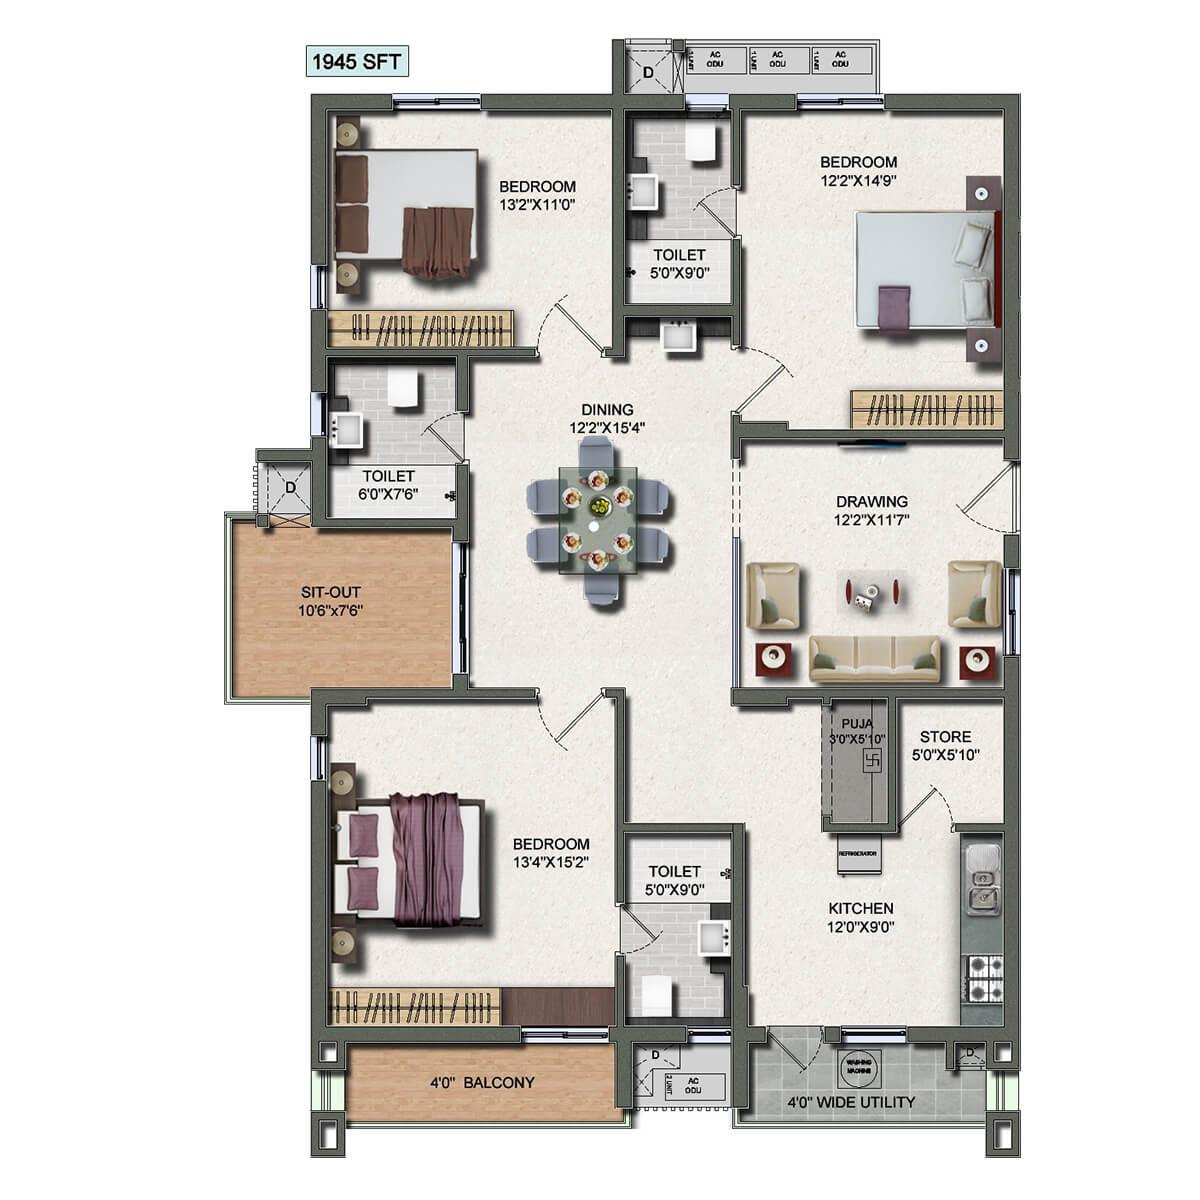 vertex panache apartment 3bhk 1945sqft 1